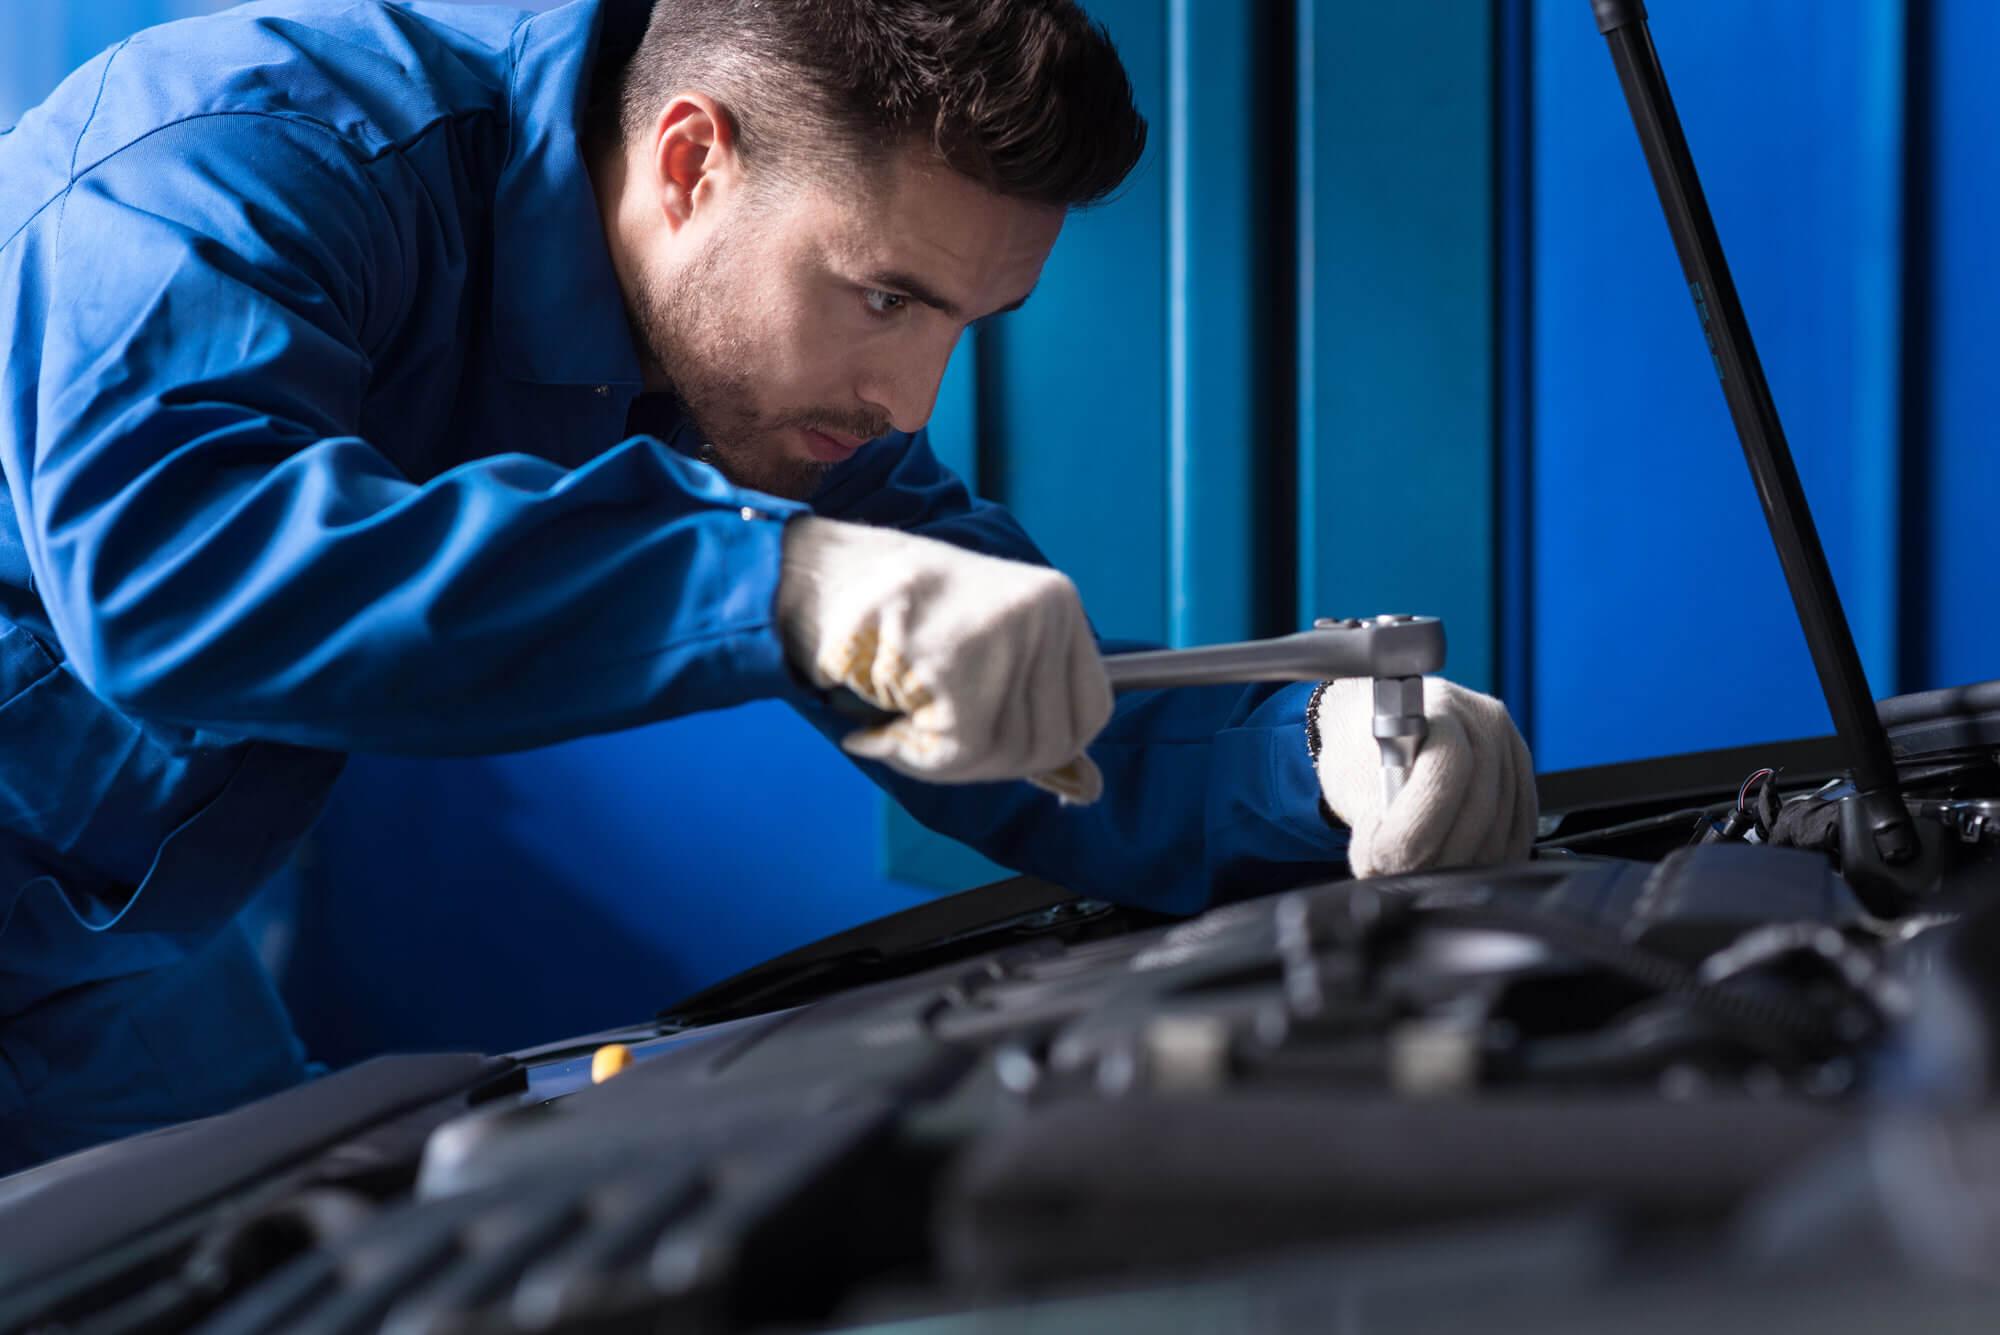 Preventative maintenance servicing